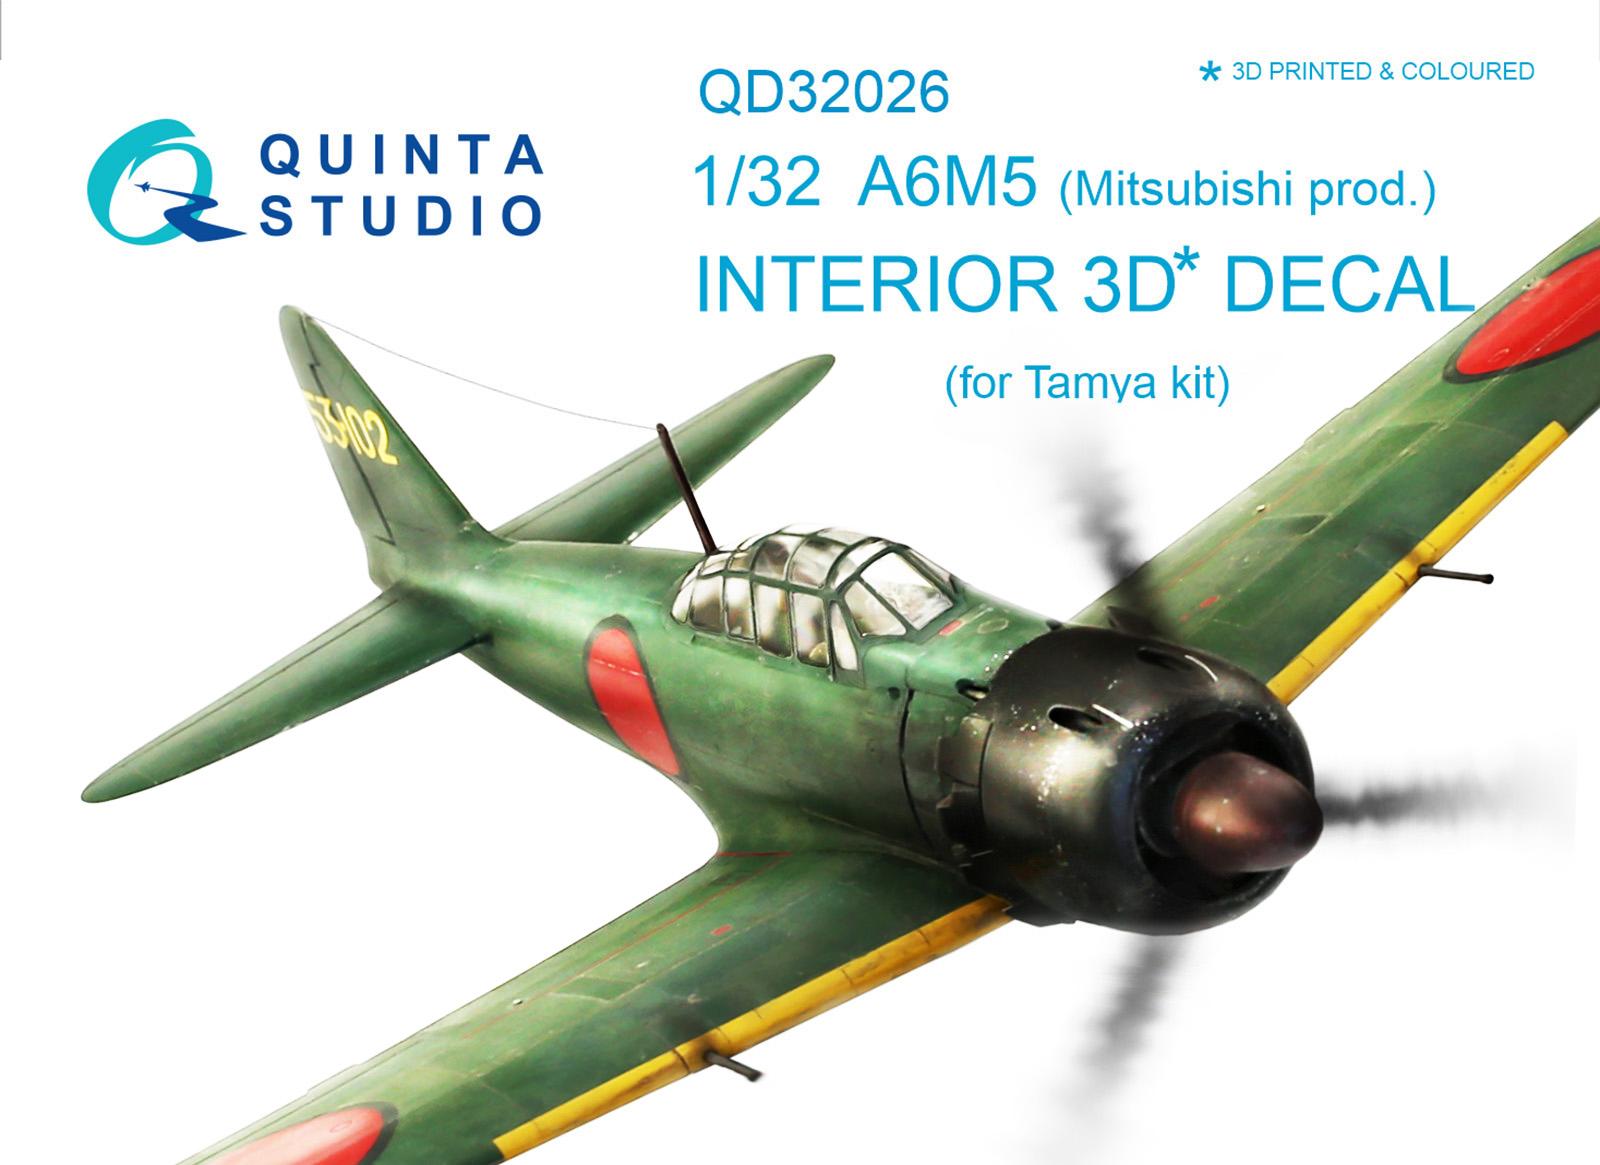 QD32026